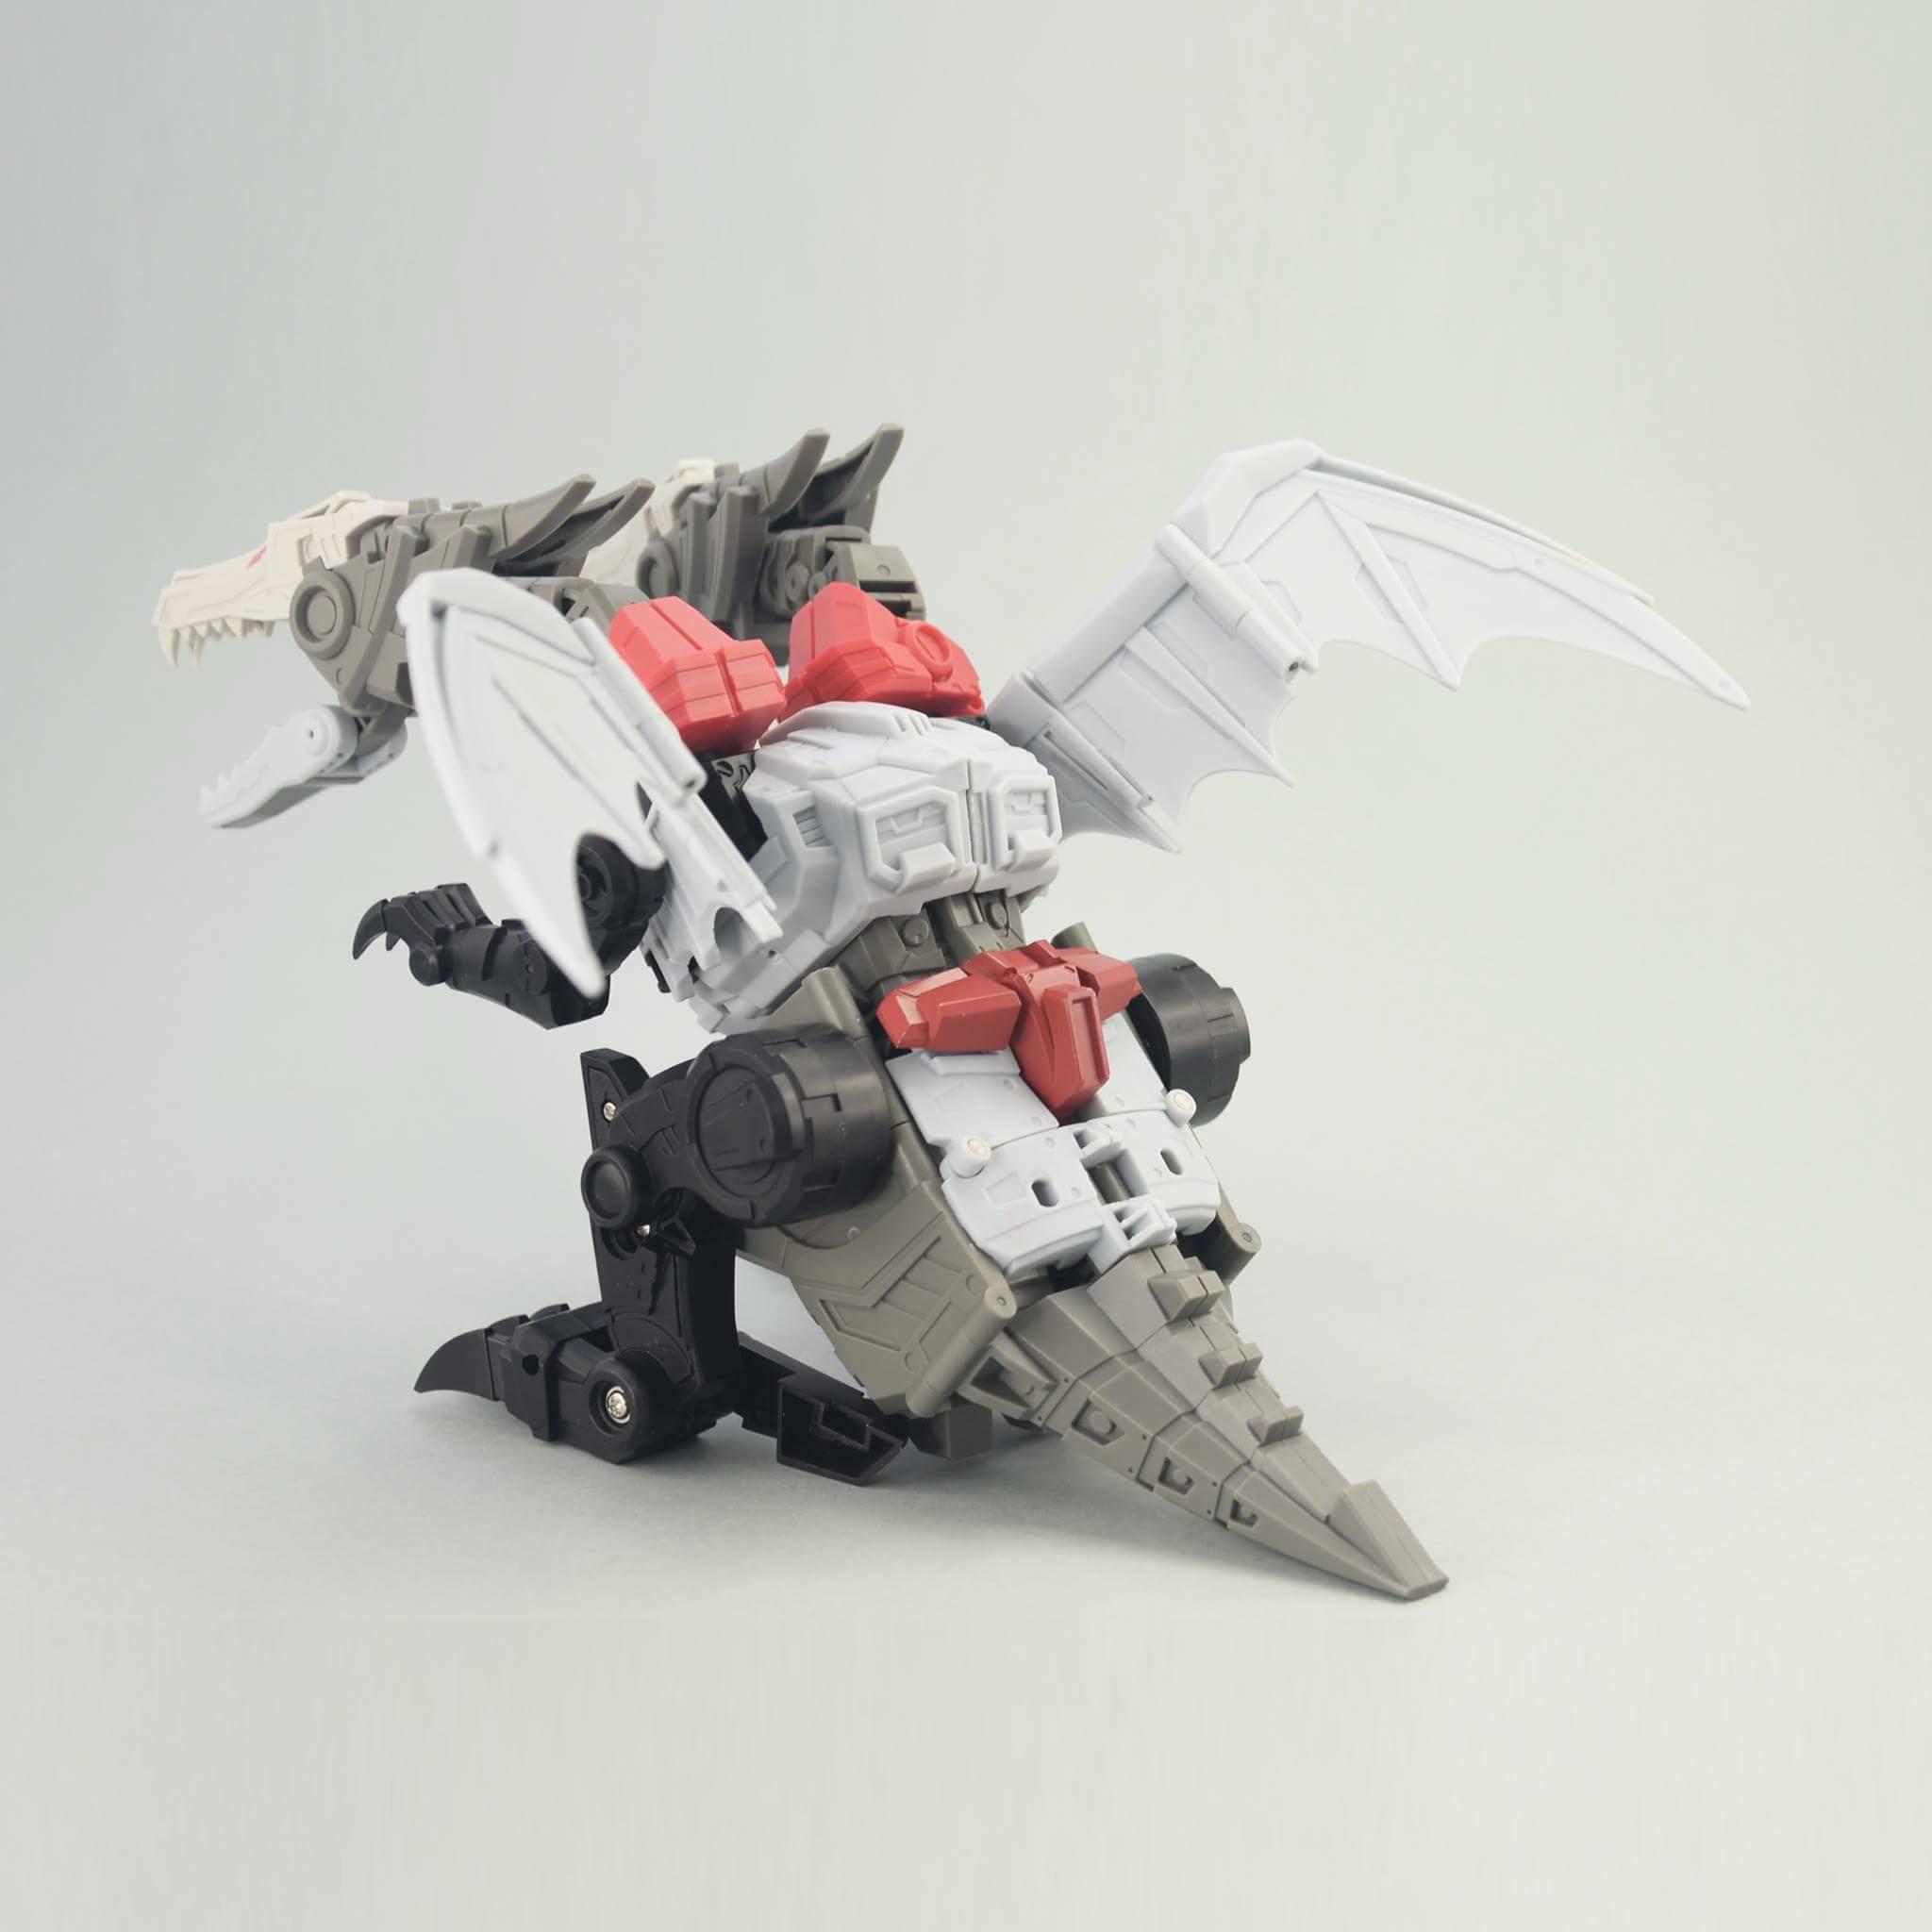 [FansHobby] Produit Tiers - Master Builder MB-02/03/05 - aka Monsterbots/Monstrebots - Page 2 BpeyMyTk